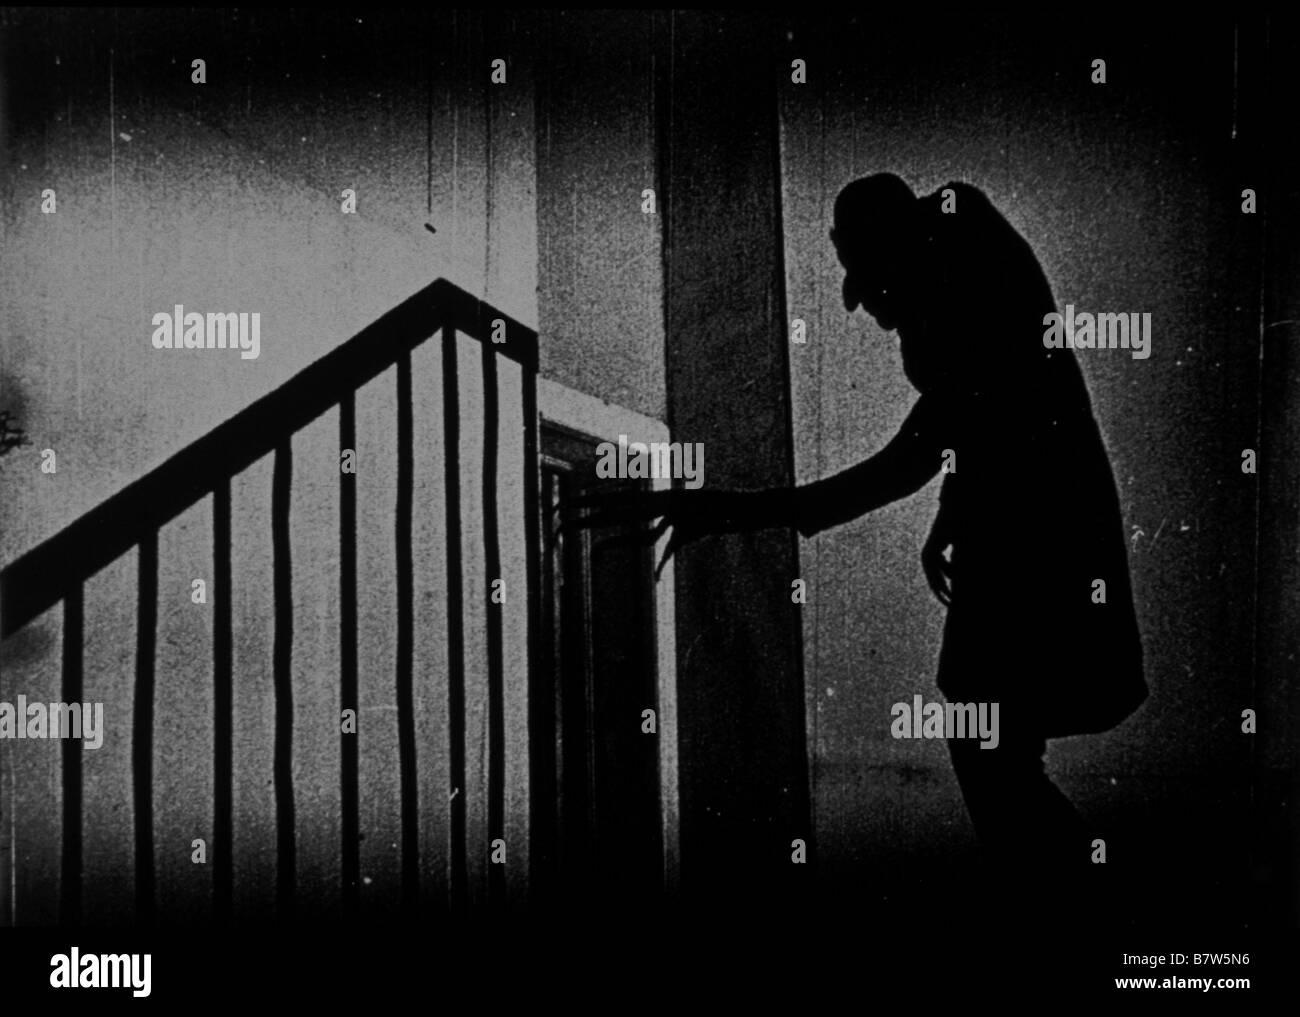 Nosferatu, eine Symphonie des Grauens Nosferatu, une symphonie de la terreur Année: 1922 - Allemagne Photo Stock